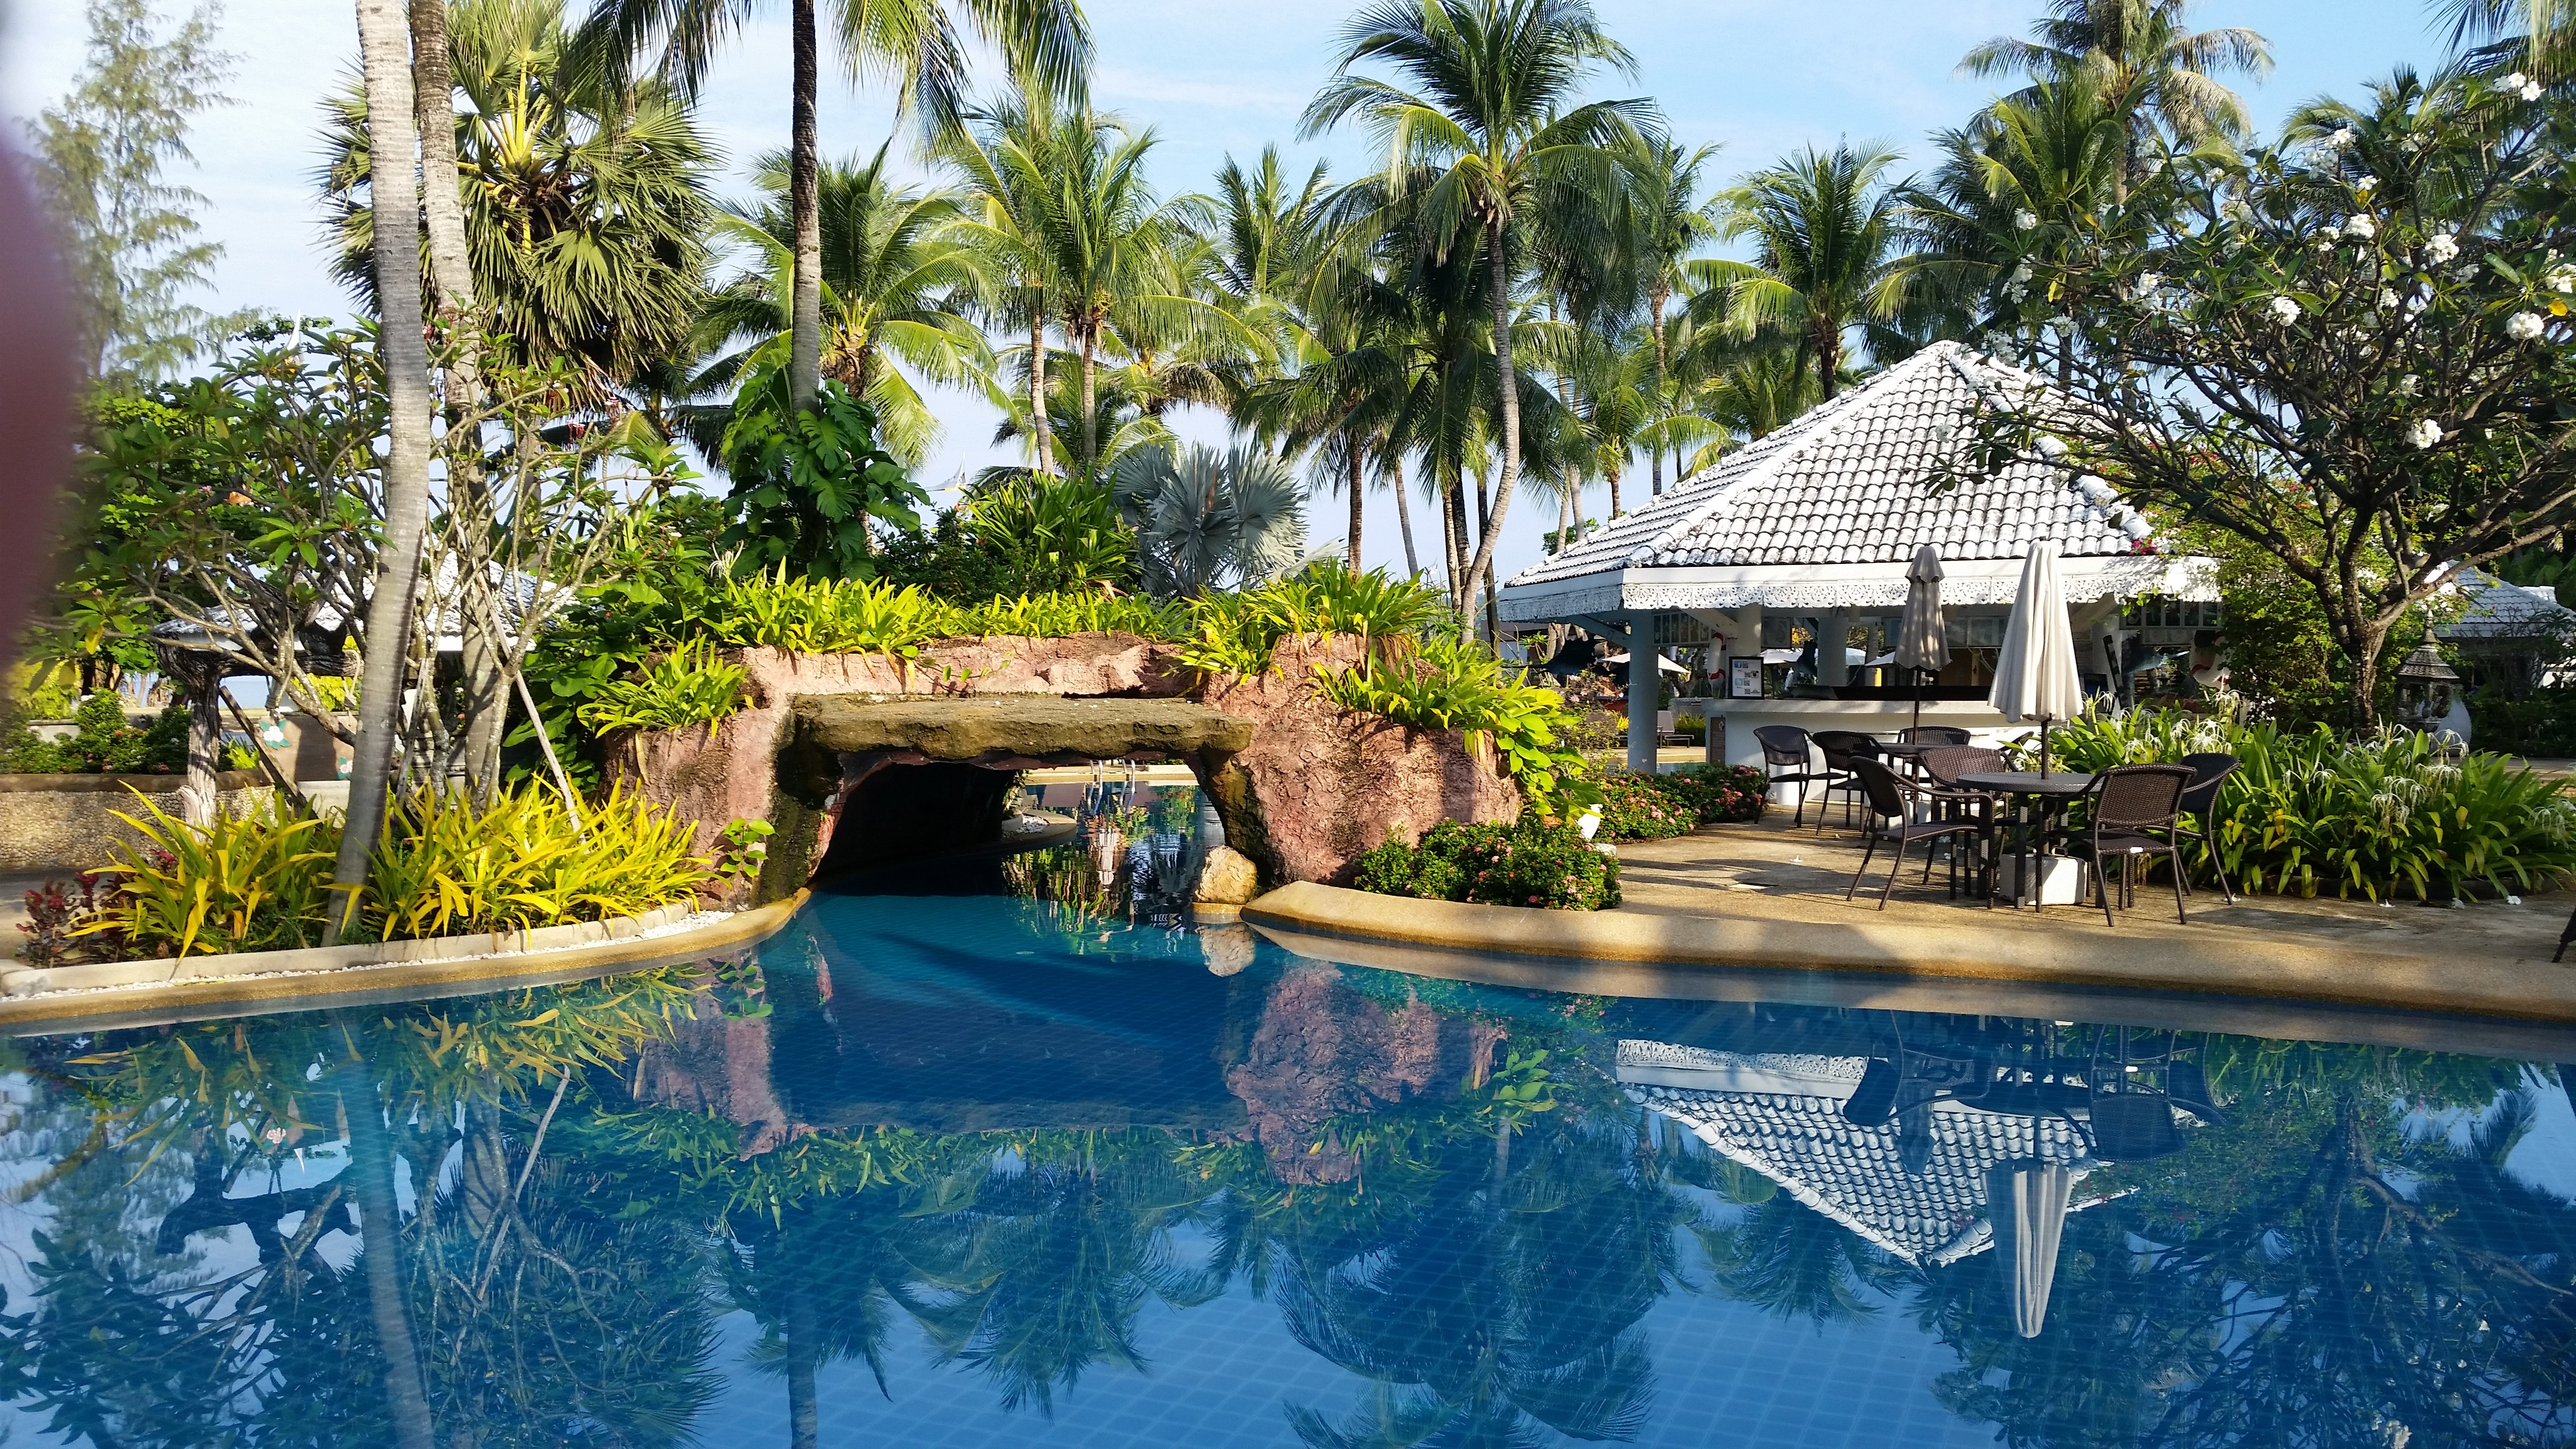 thavornpalmbeachresort(普吉岛塔夫棕榈海滩度假村)别墅浅水湾怎么样宁波图片